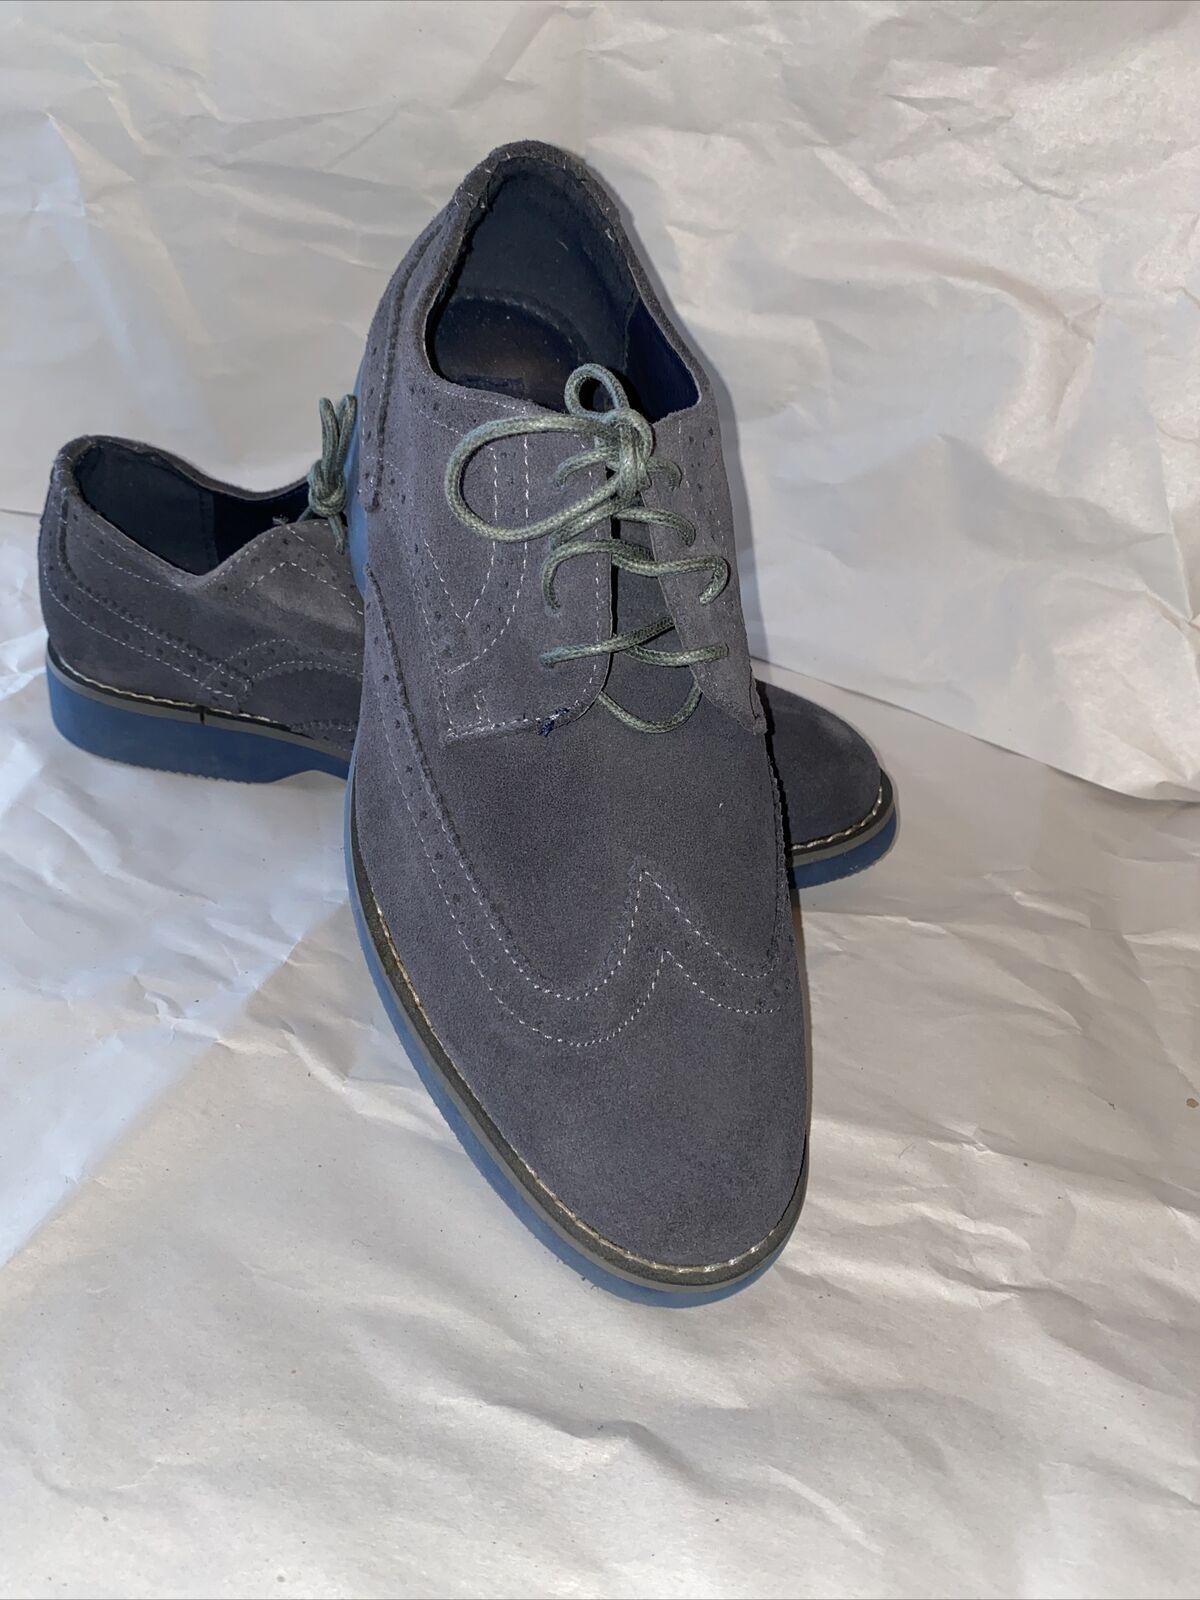 Joseph Abboud Grayish Beige Suede Wingtip Dress Shoes Men's Size 9.5